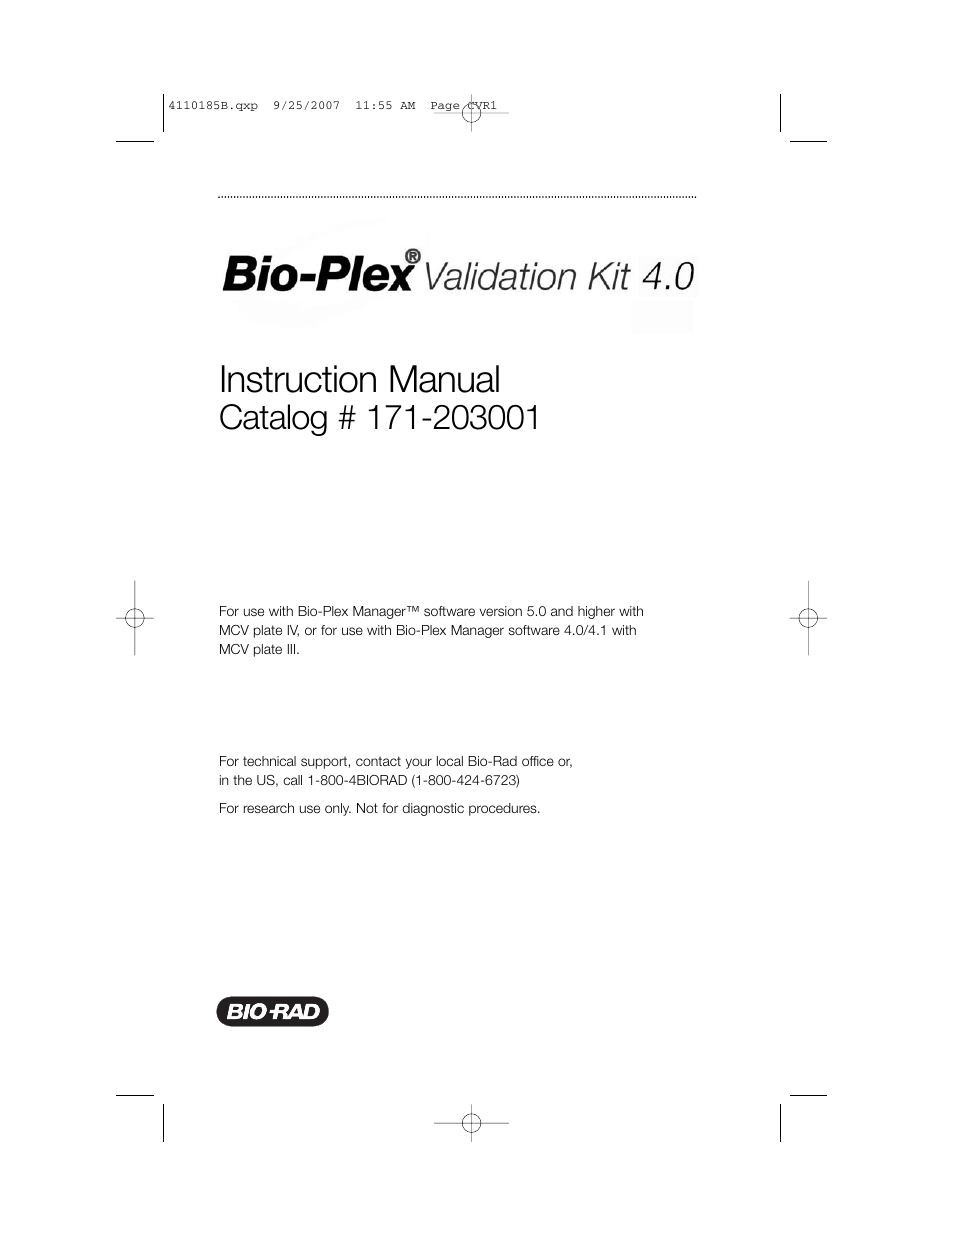 Bio-Rad Bio-Plex System Validation and Calibration Tools User Manual